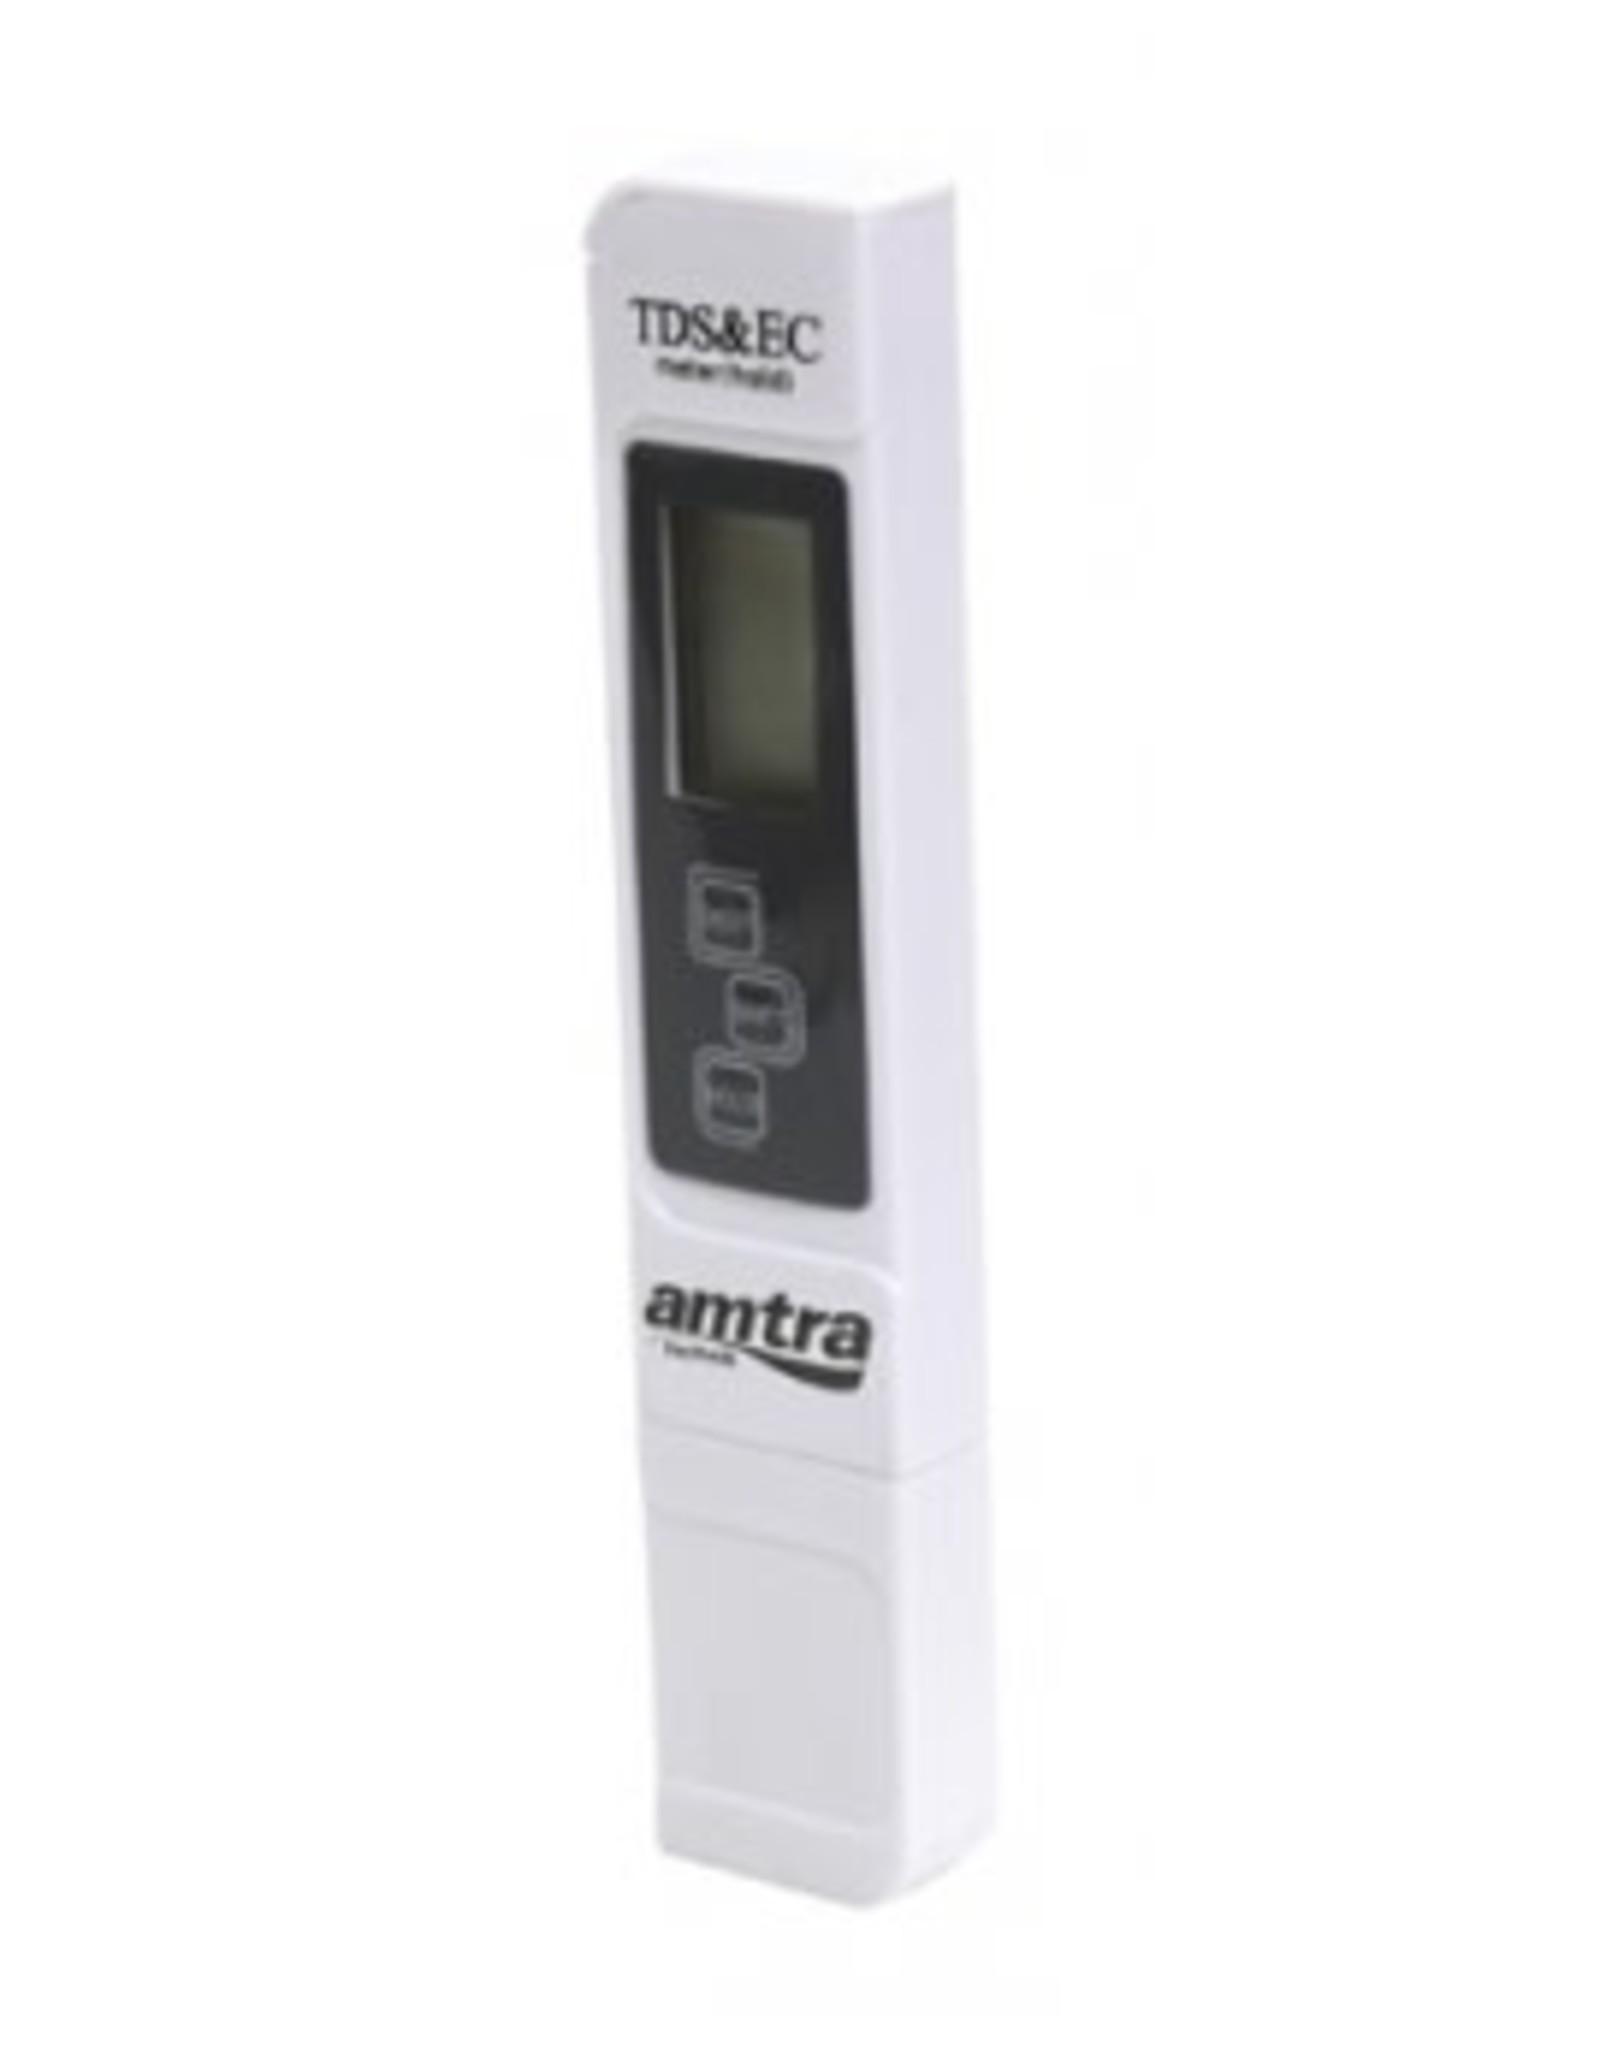 Wave/Amtra Digital conductivity meter